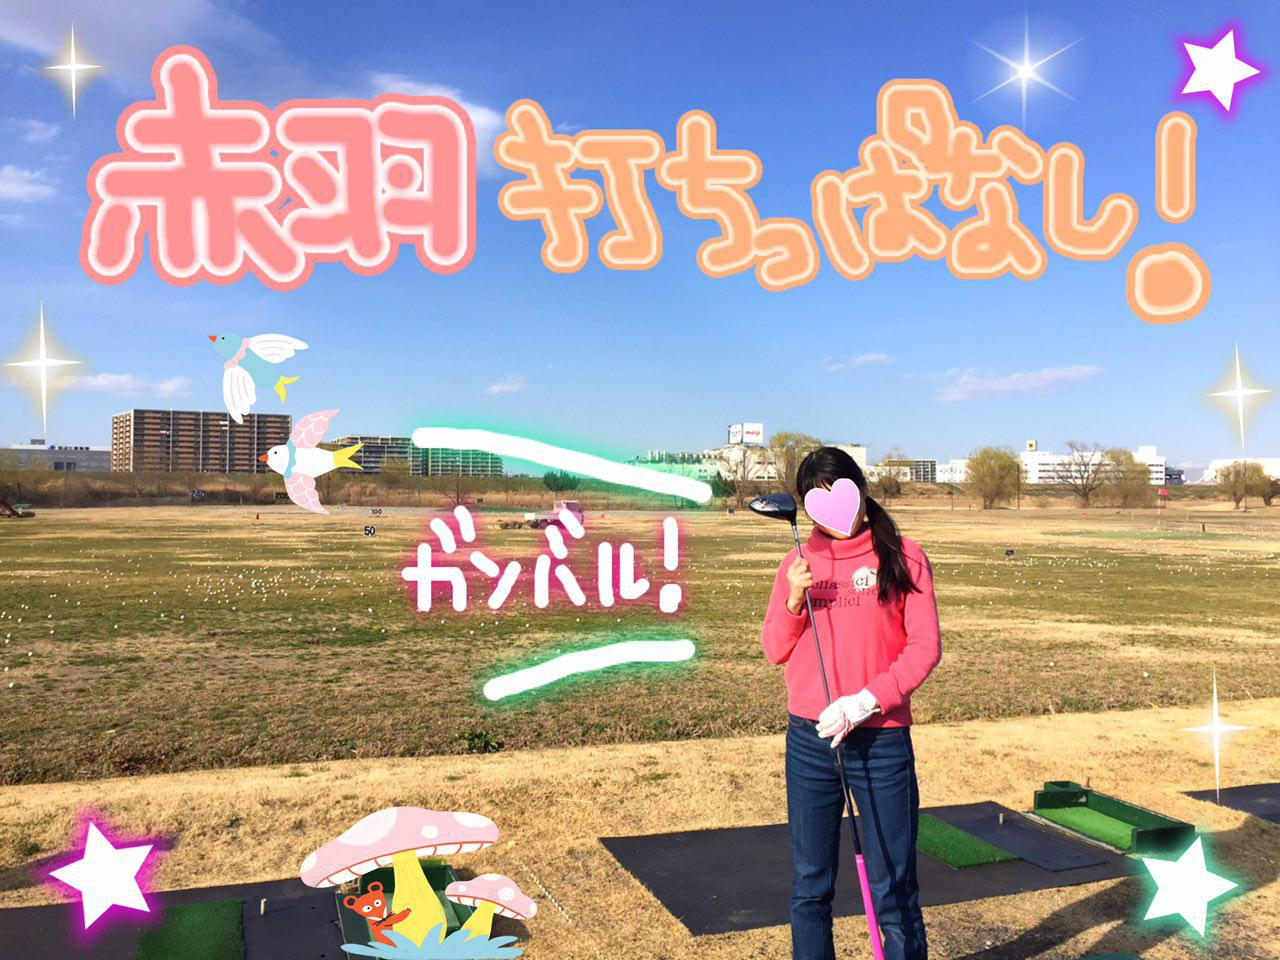 photo_2017-03-11_00-48-28.jpg